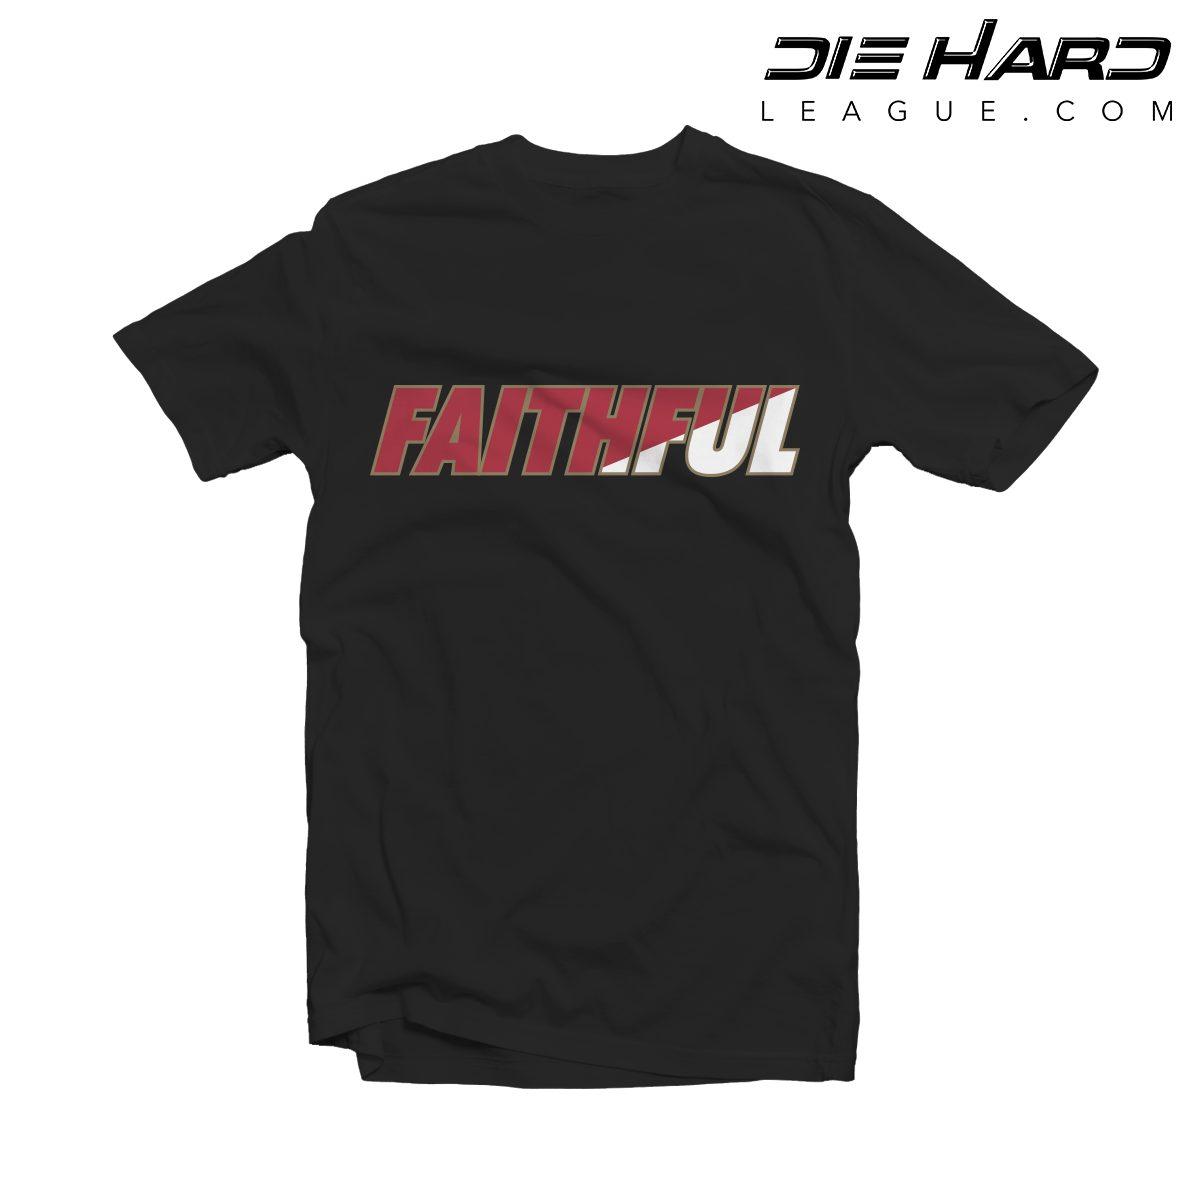 Shop. Home San Francisco 49ers Shop San Francisco 49ers Shirts 49er T Shirts  – San Francisco 49ers FAITHFUL Black Tee e121e1810